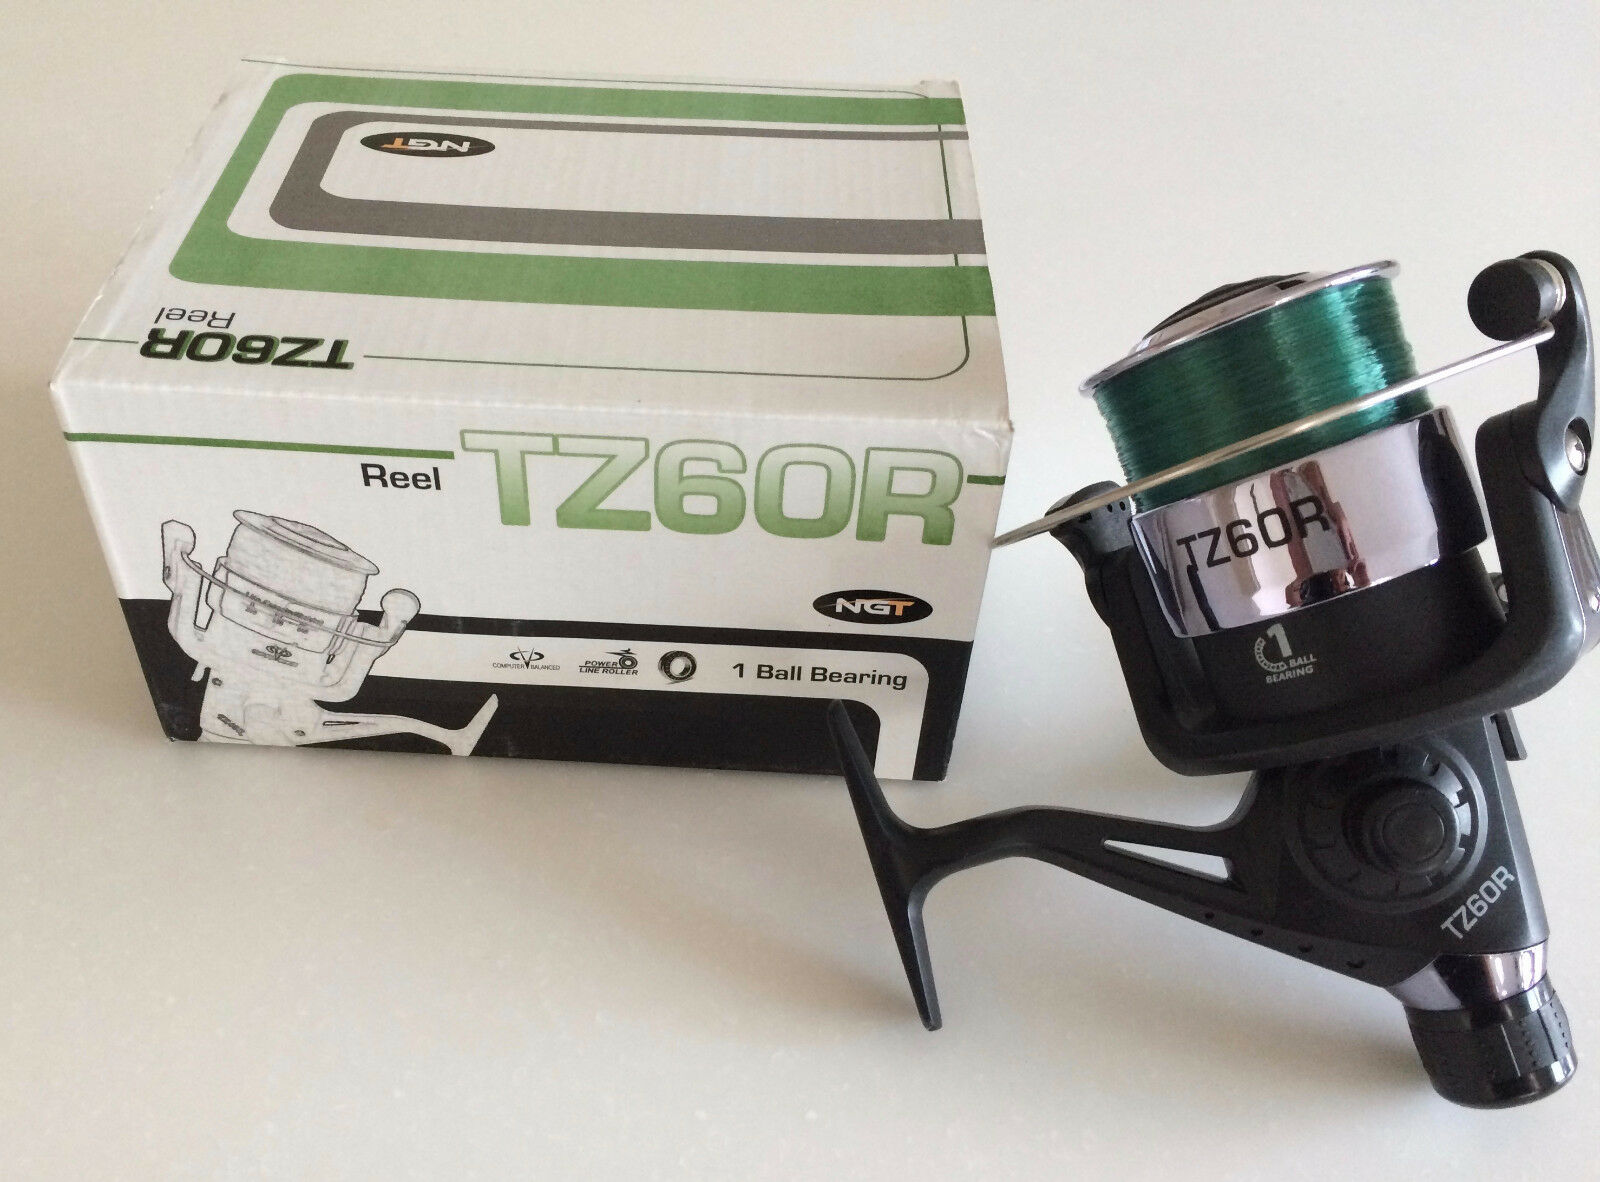 JOB LOT 6 X NGT TZ60R FISHING REEL BRAND NEW SHOP MARKET TRADERS CAR BOOT